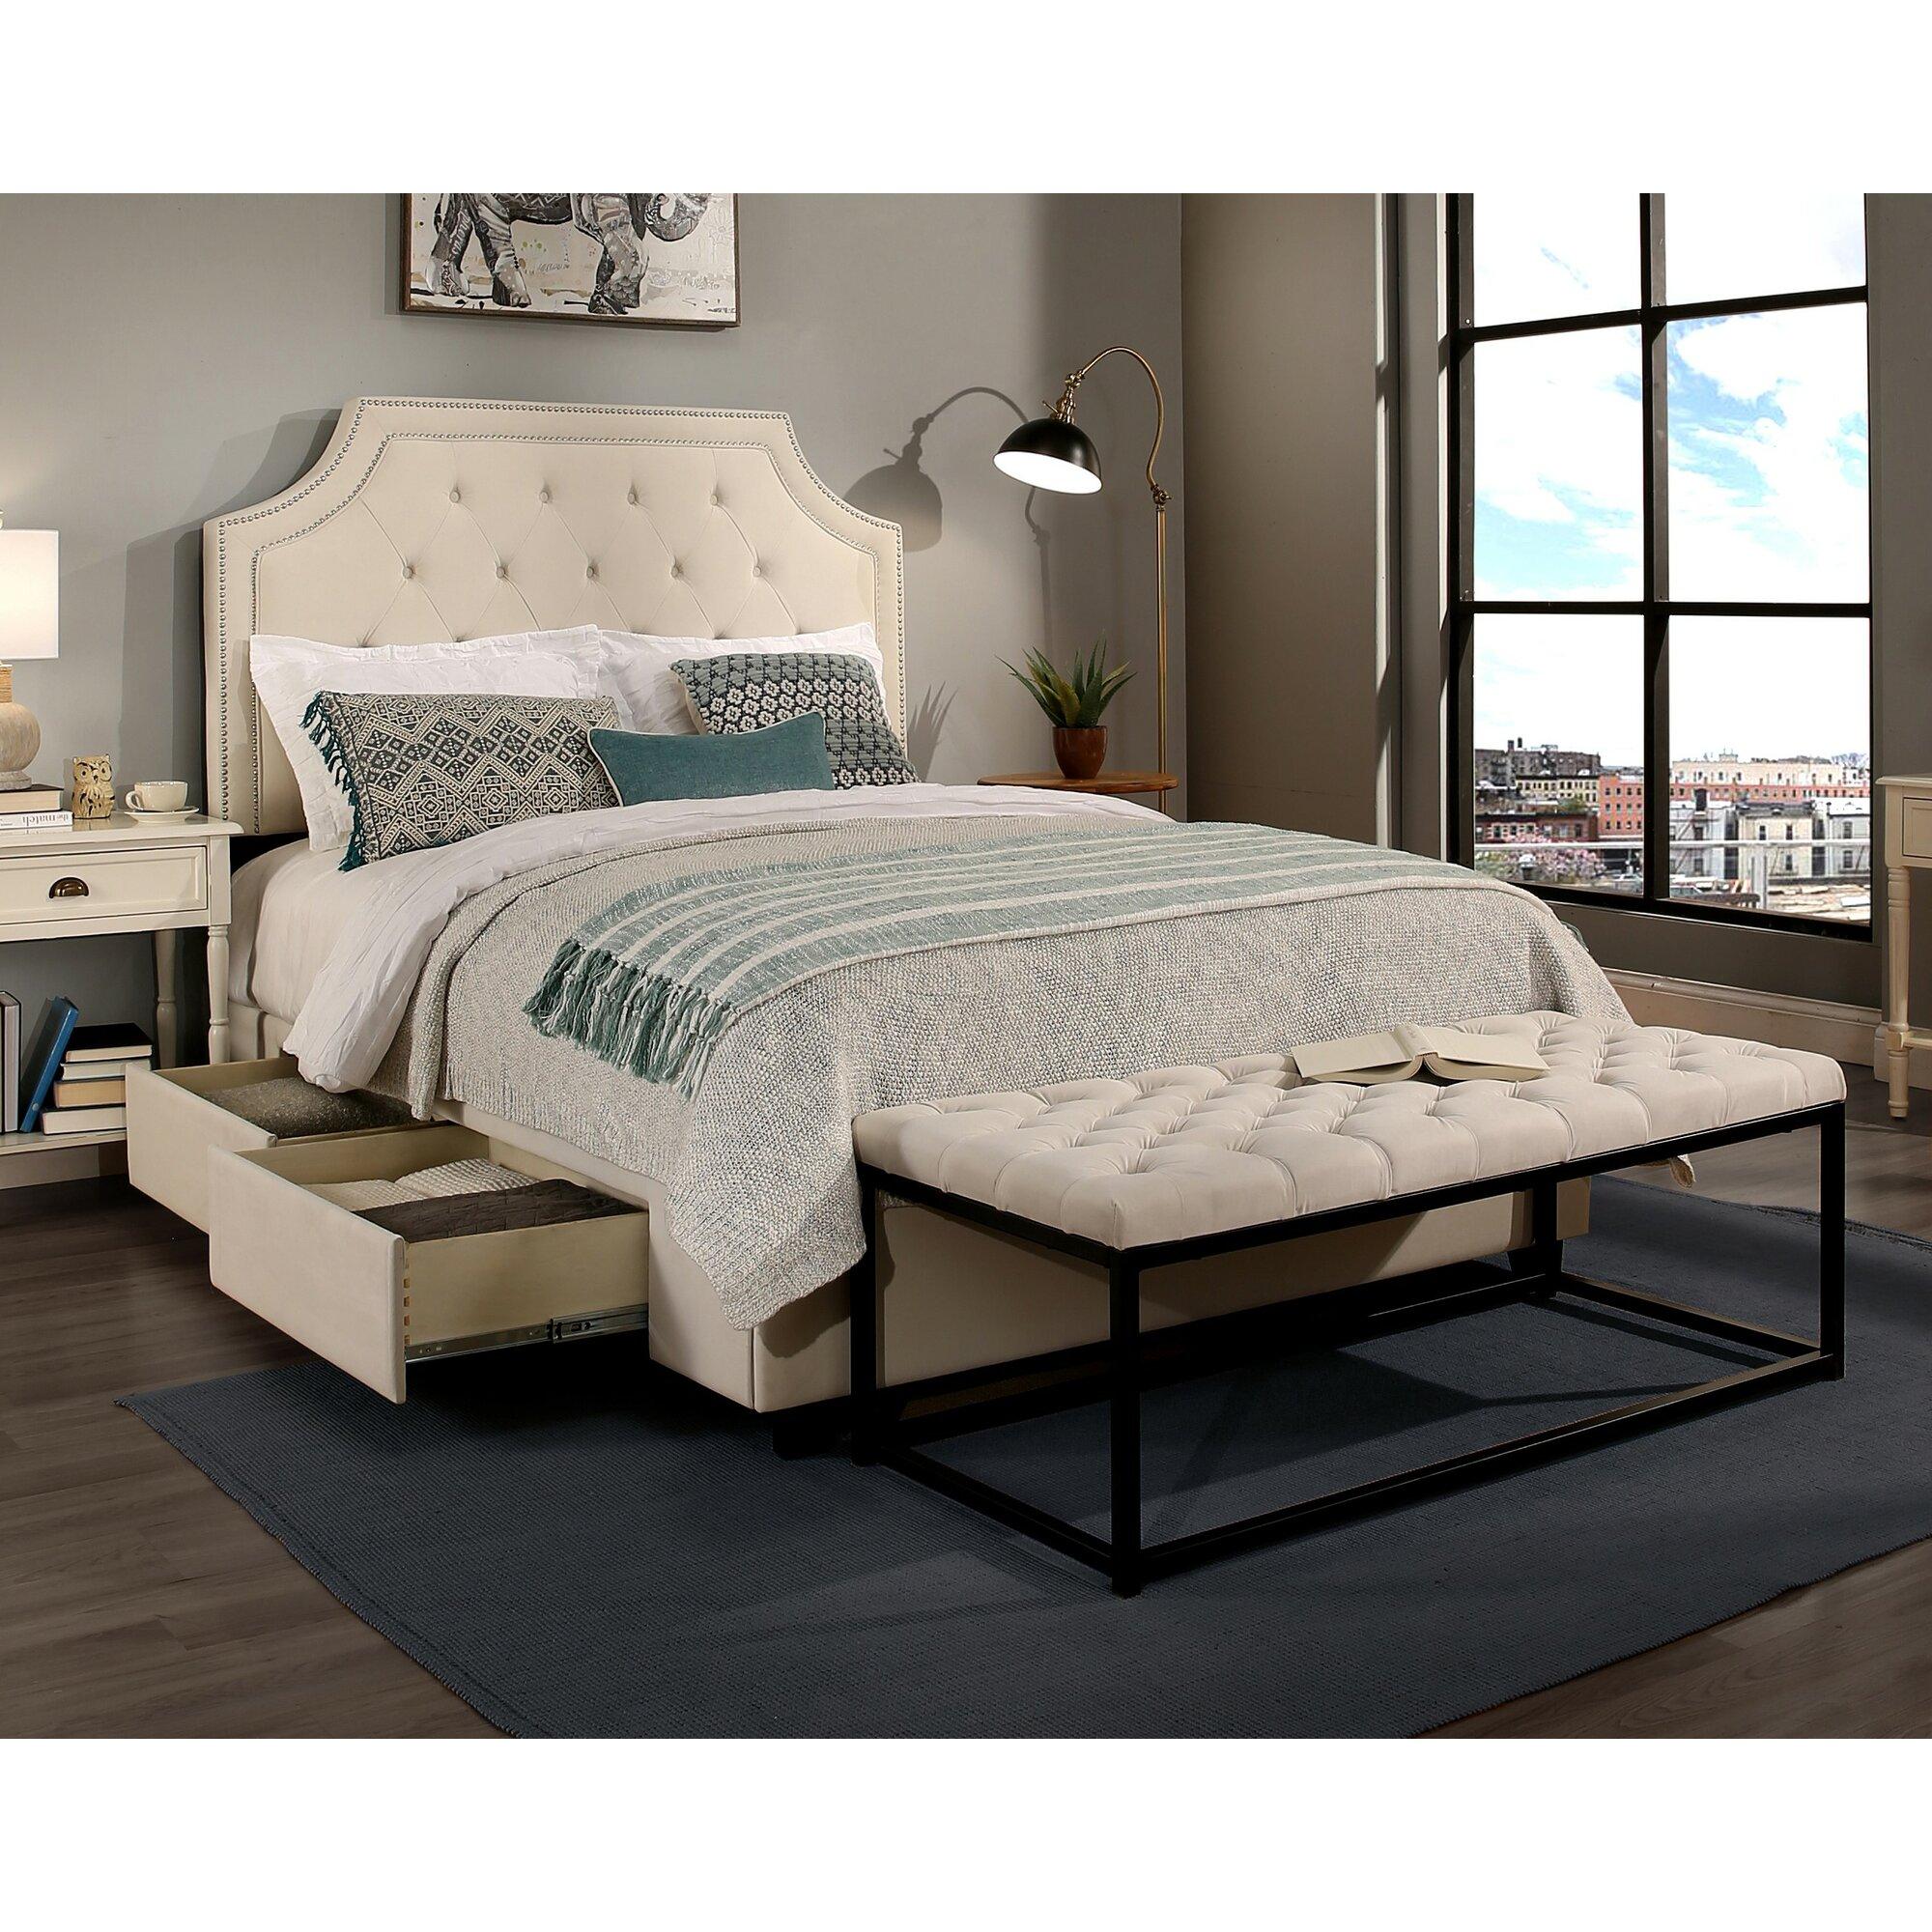 Bedroom Sets You\'ll Love